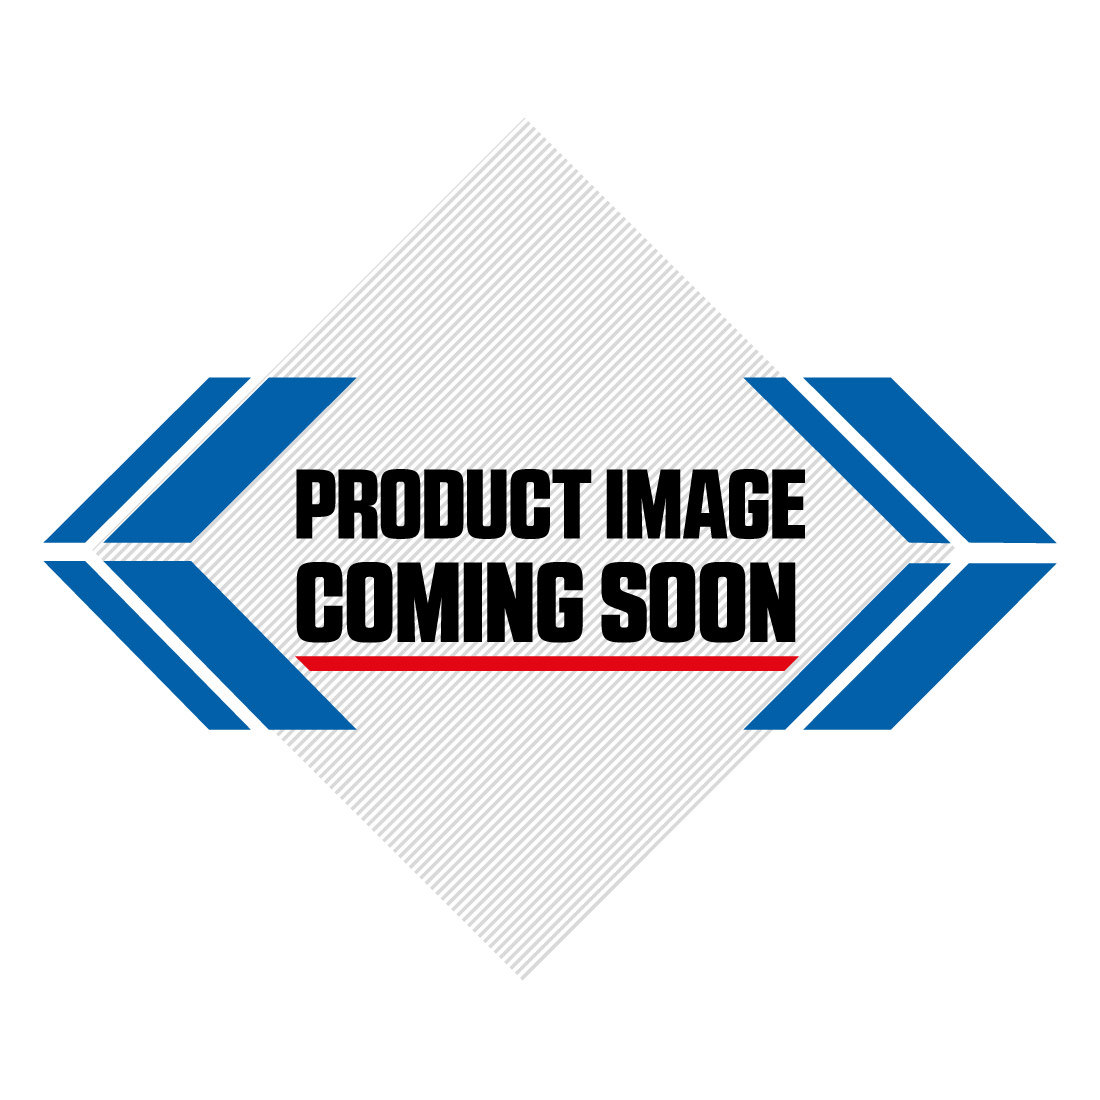 Suzuki Plastic Kit RMZ 450 (08-17) OEM Factory Image-2